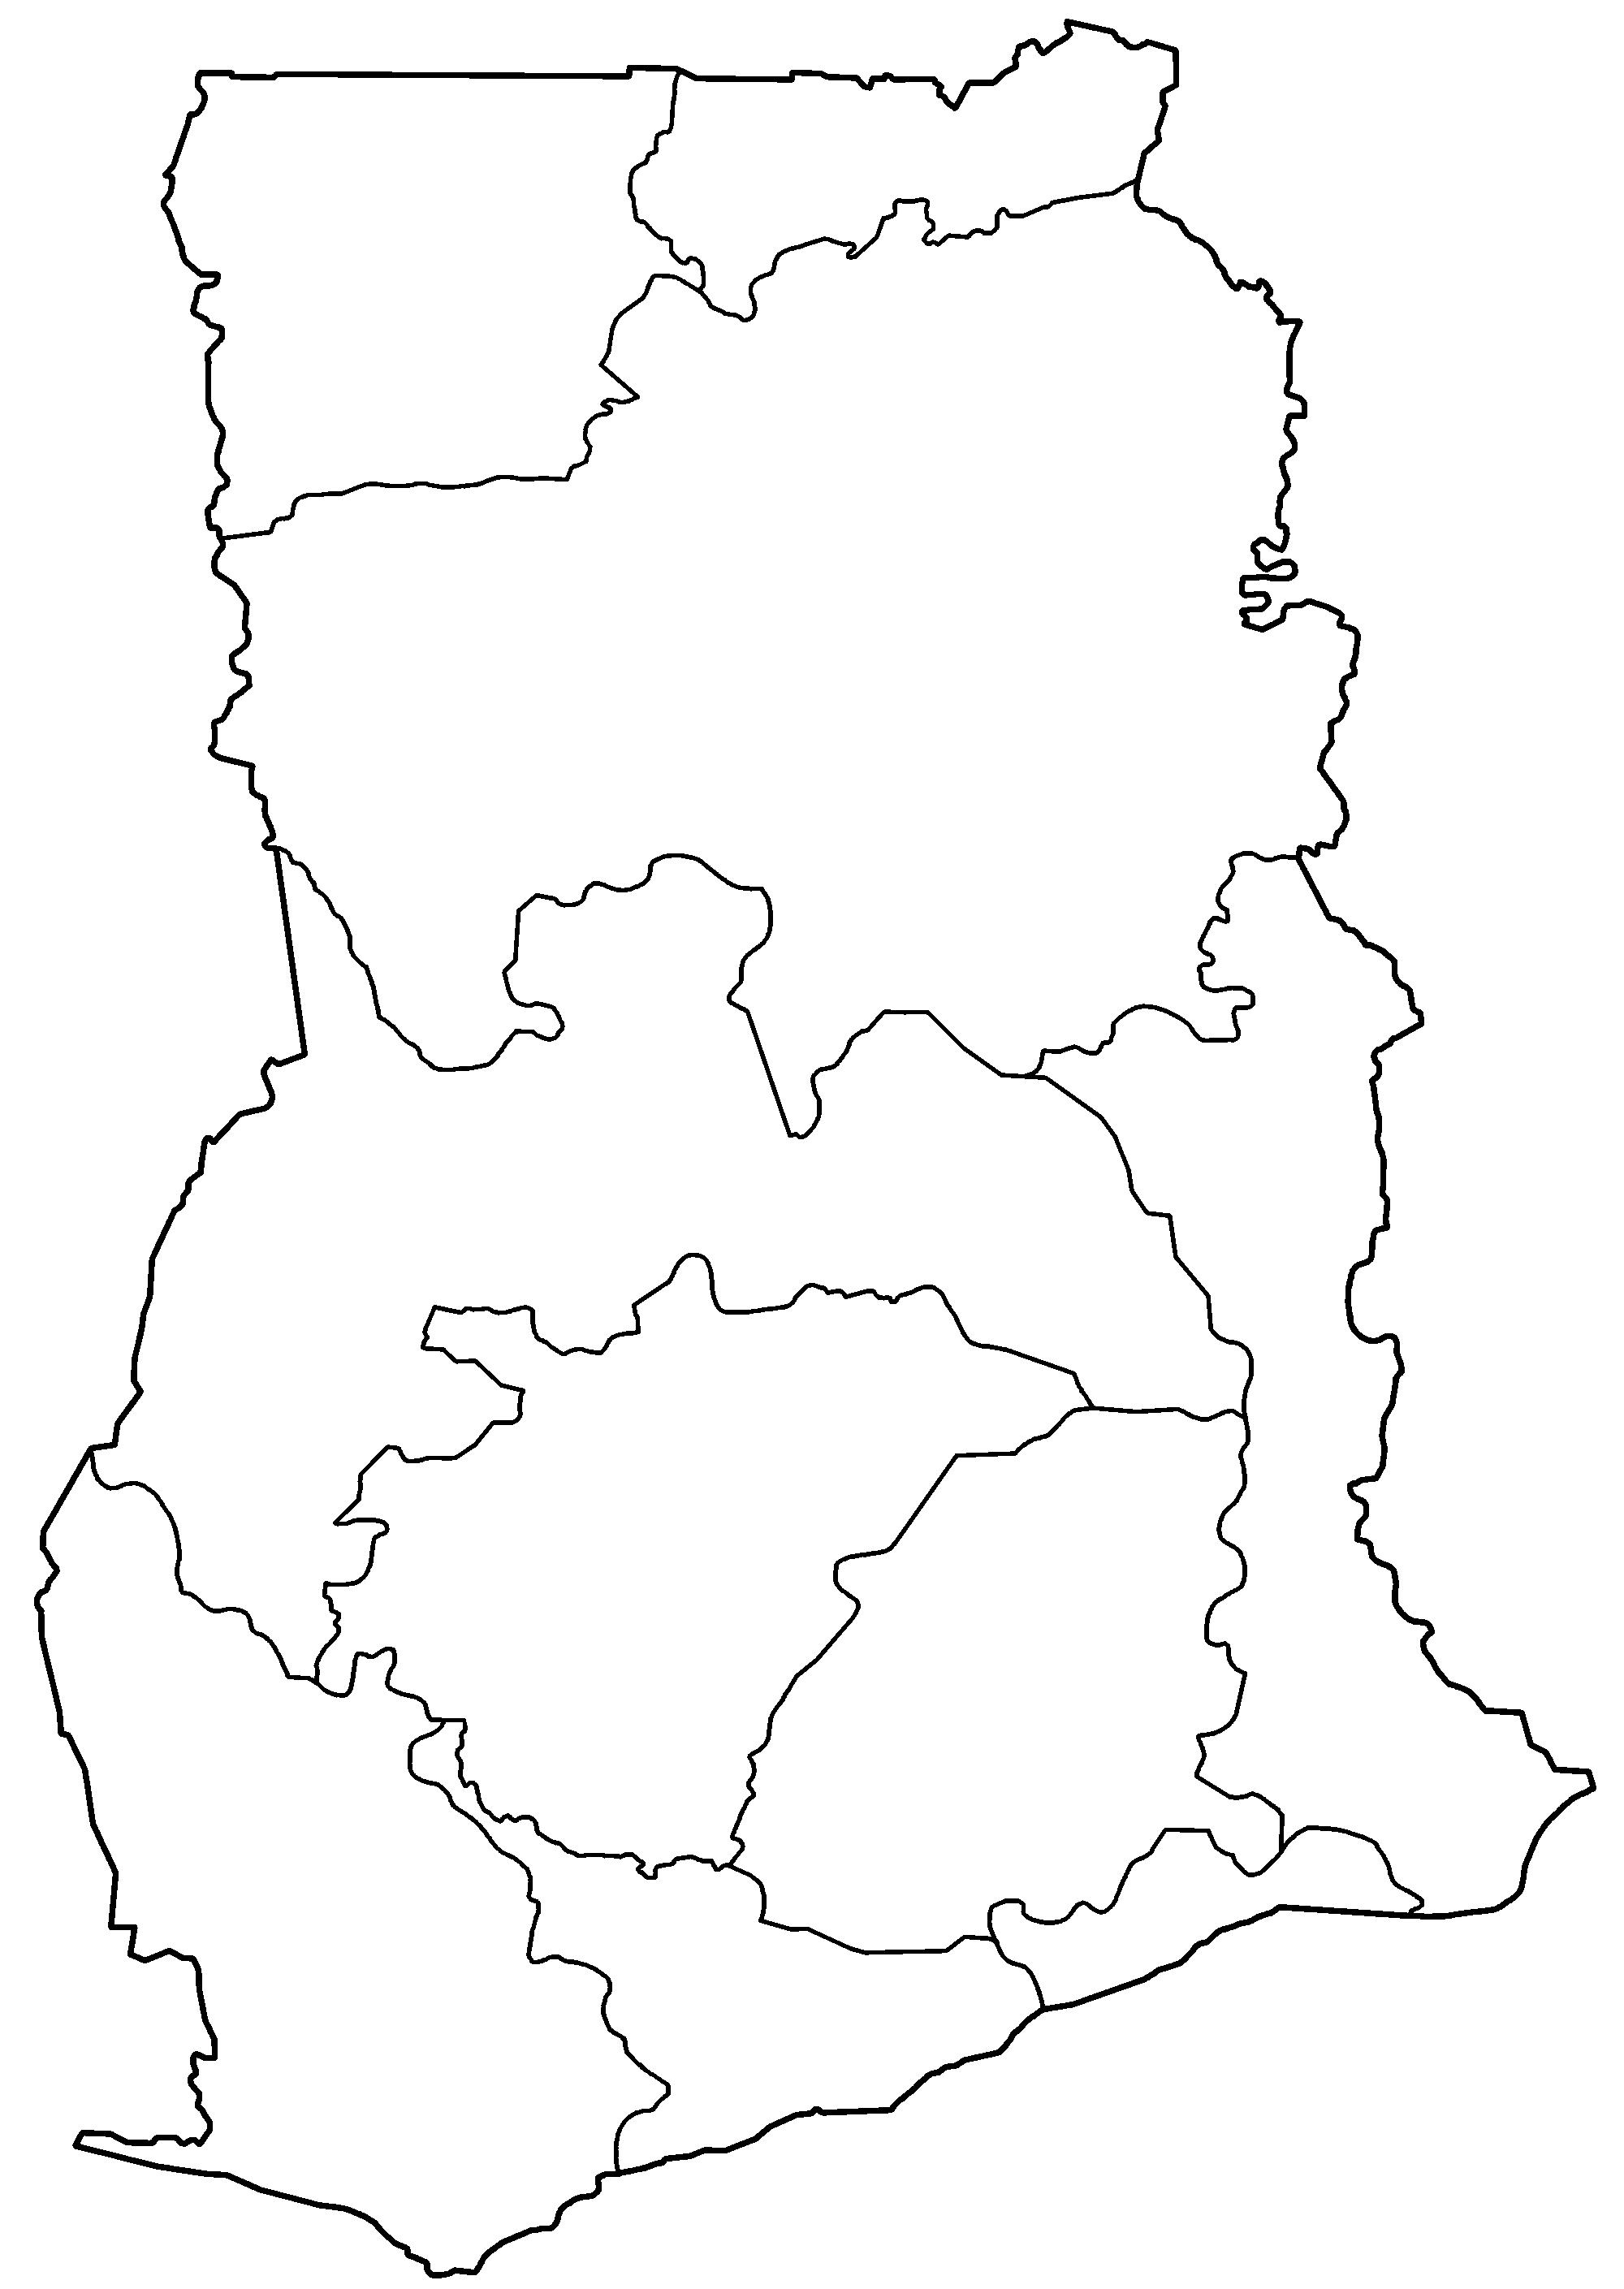 FileGhana regions blankpng Wikimedia Commons